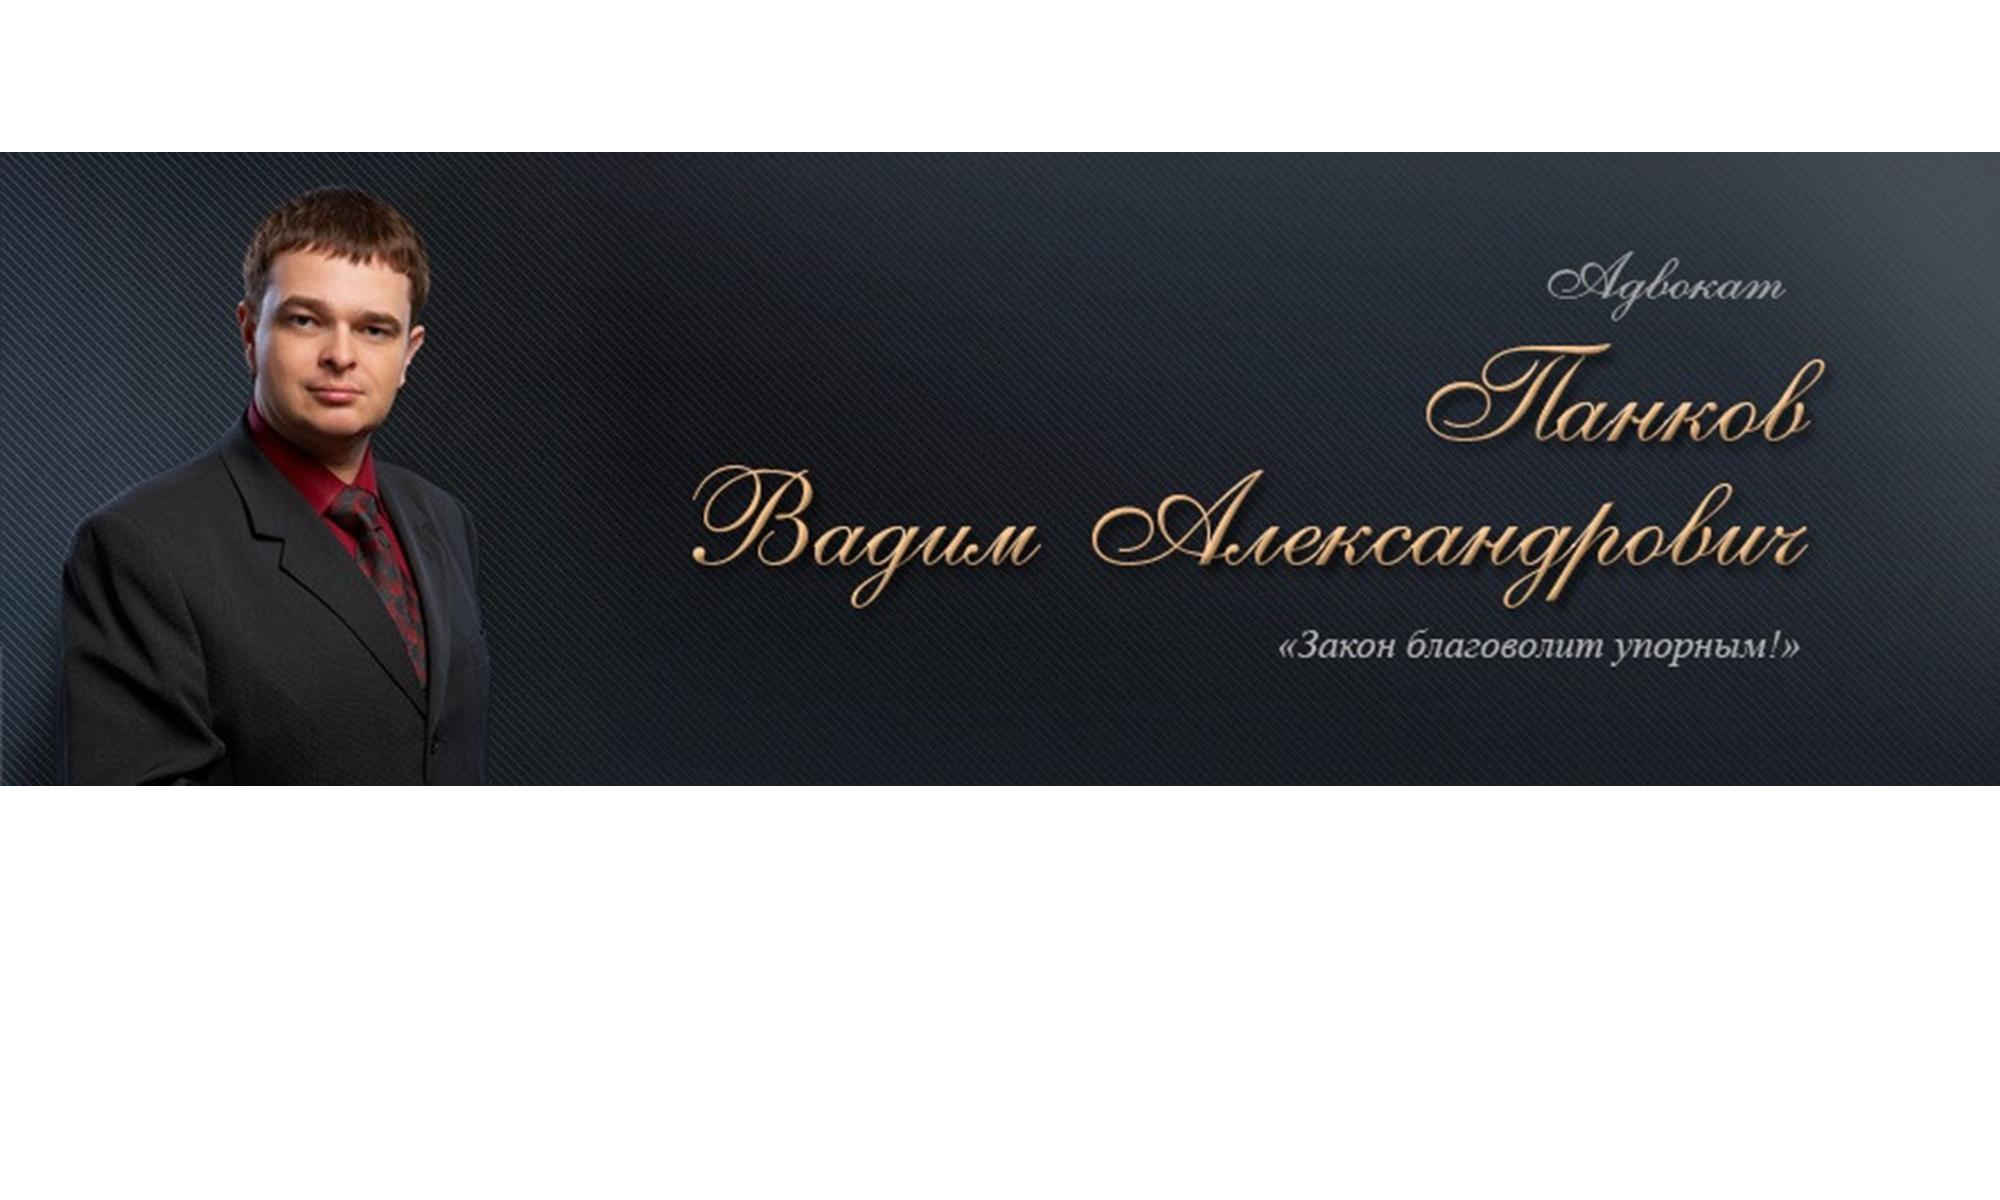 Адвокат Панков Вадим Александрович